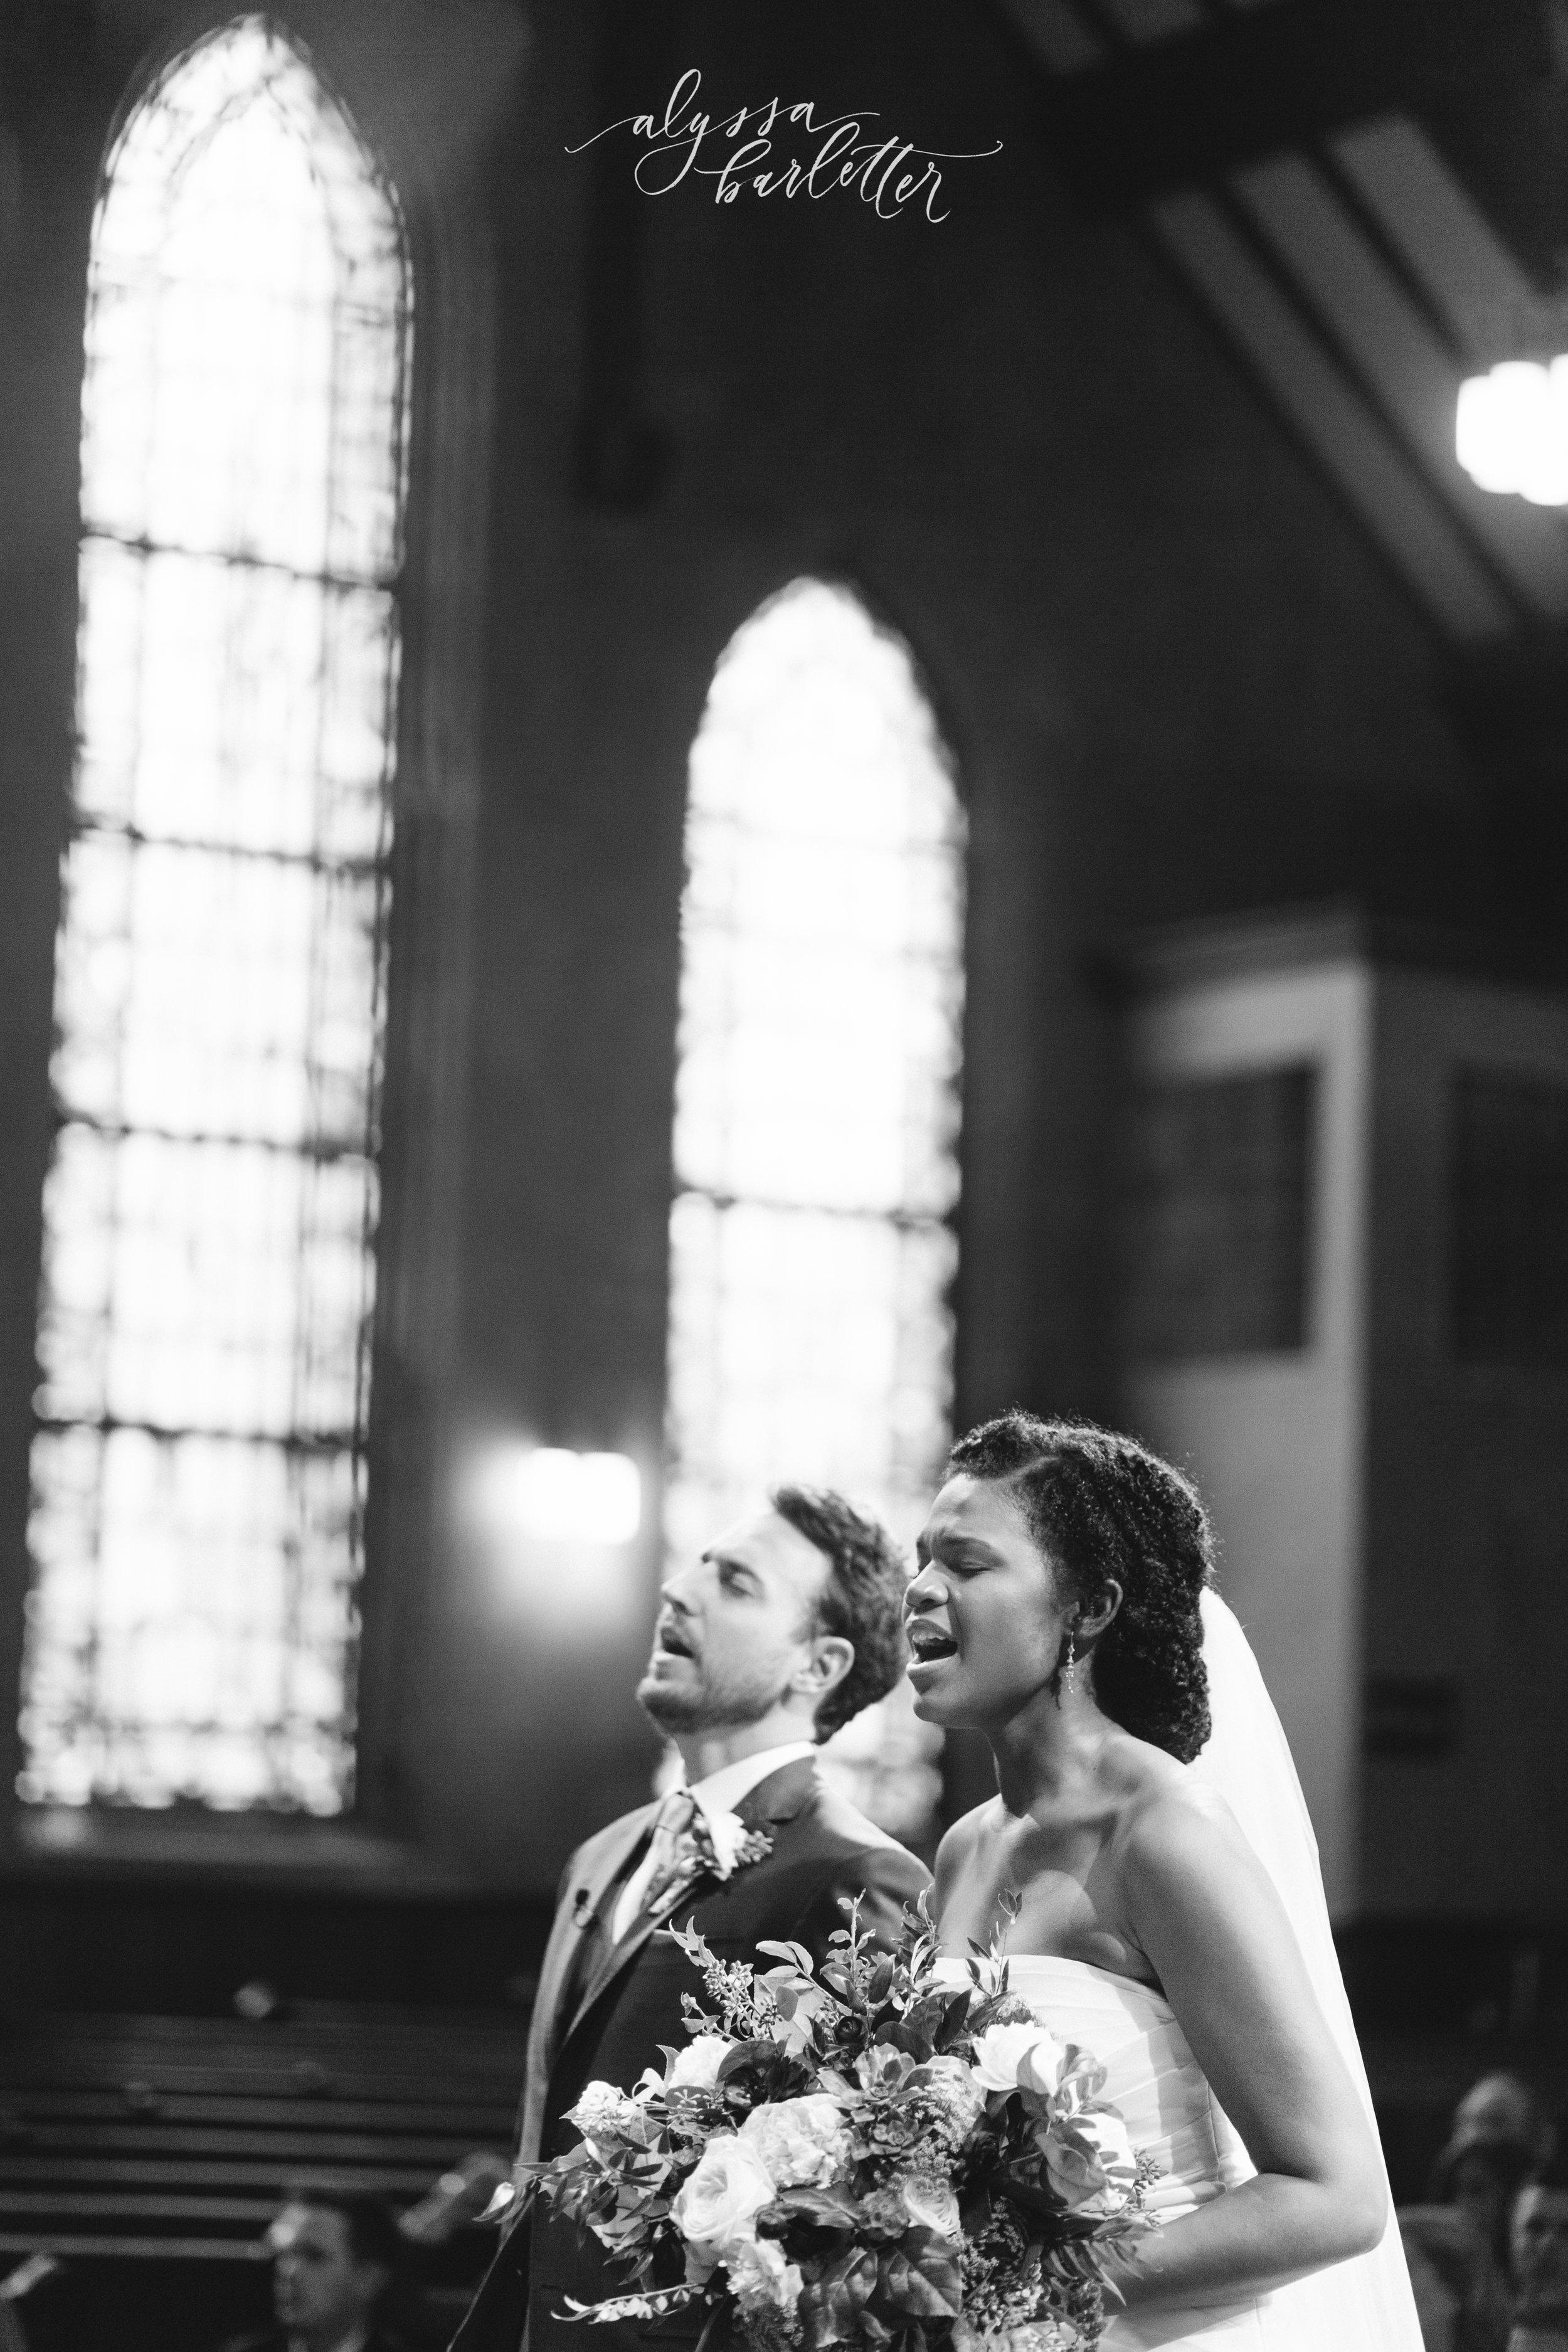 kansas city missouri wedding photographer christ community church bookside ceremony worship